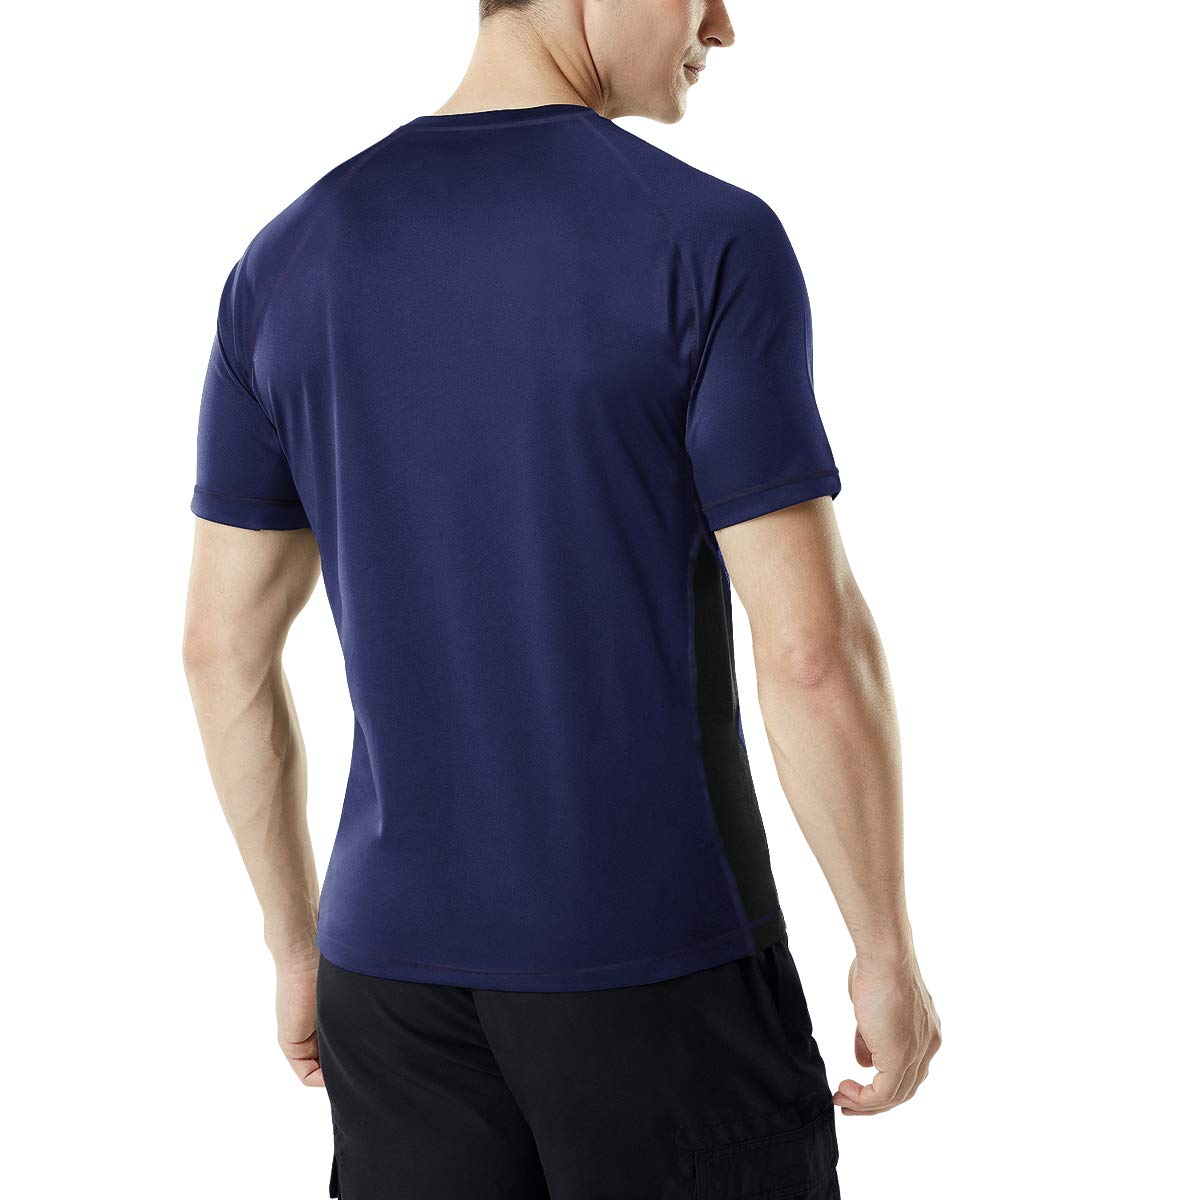 MEETYOO Kompressionsshirt Herren Laufshirt Kurzarm Funktionsshirt Atmungsaktiv Sportshirt M/änner T-Shirt f/ür Running Jogging Fitness Gym